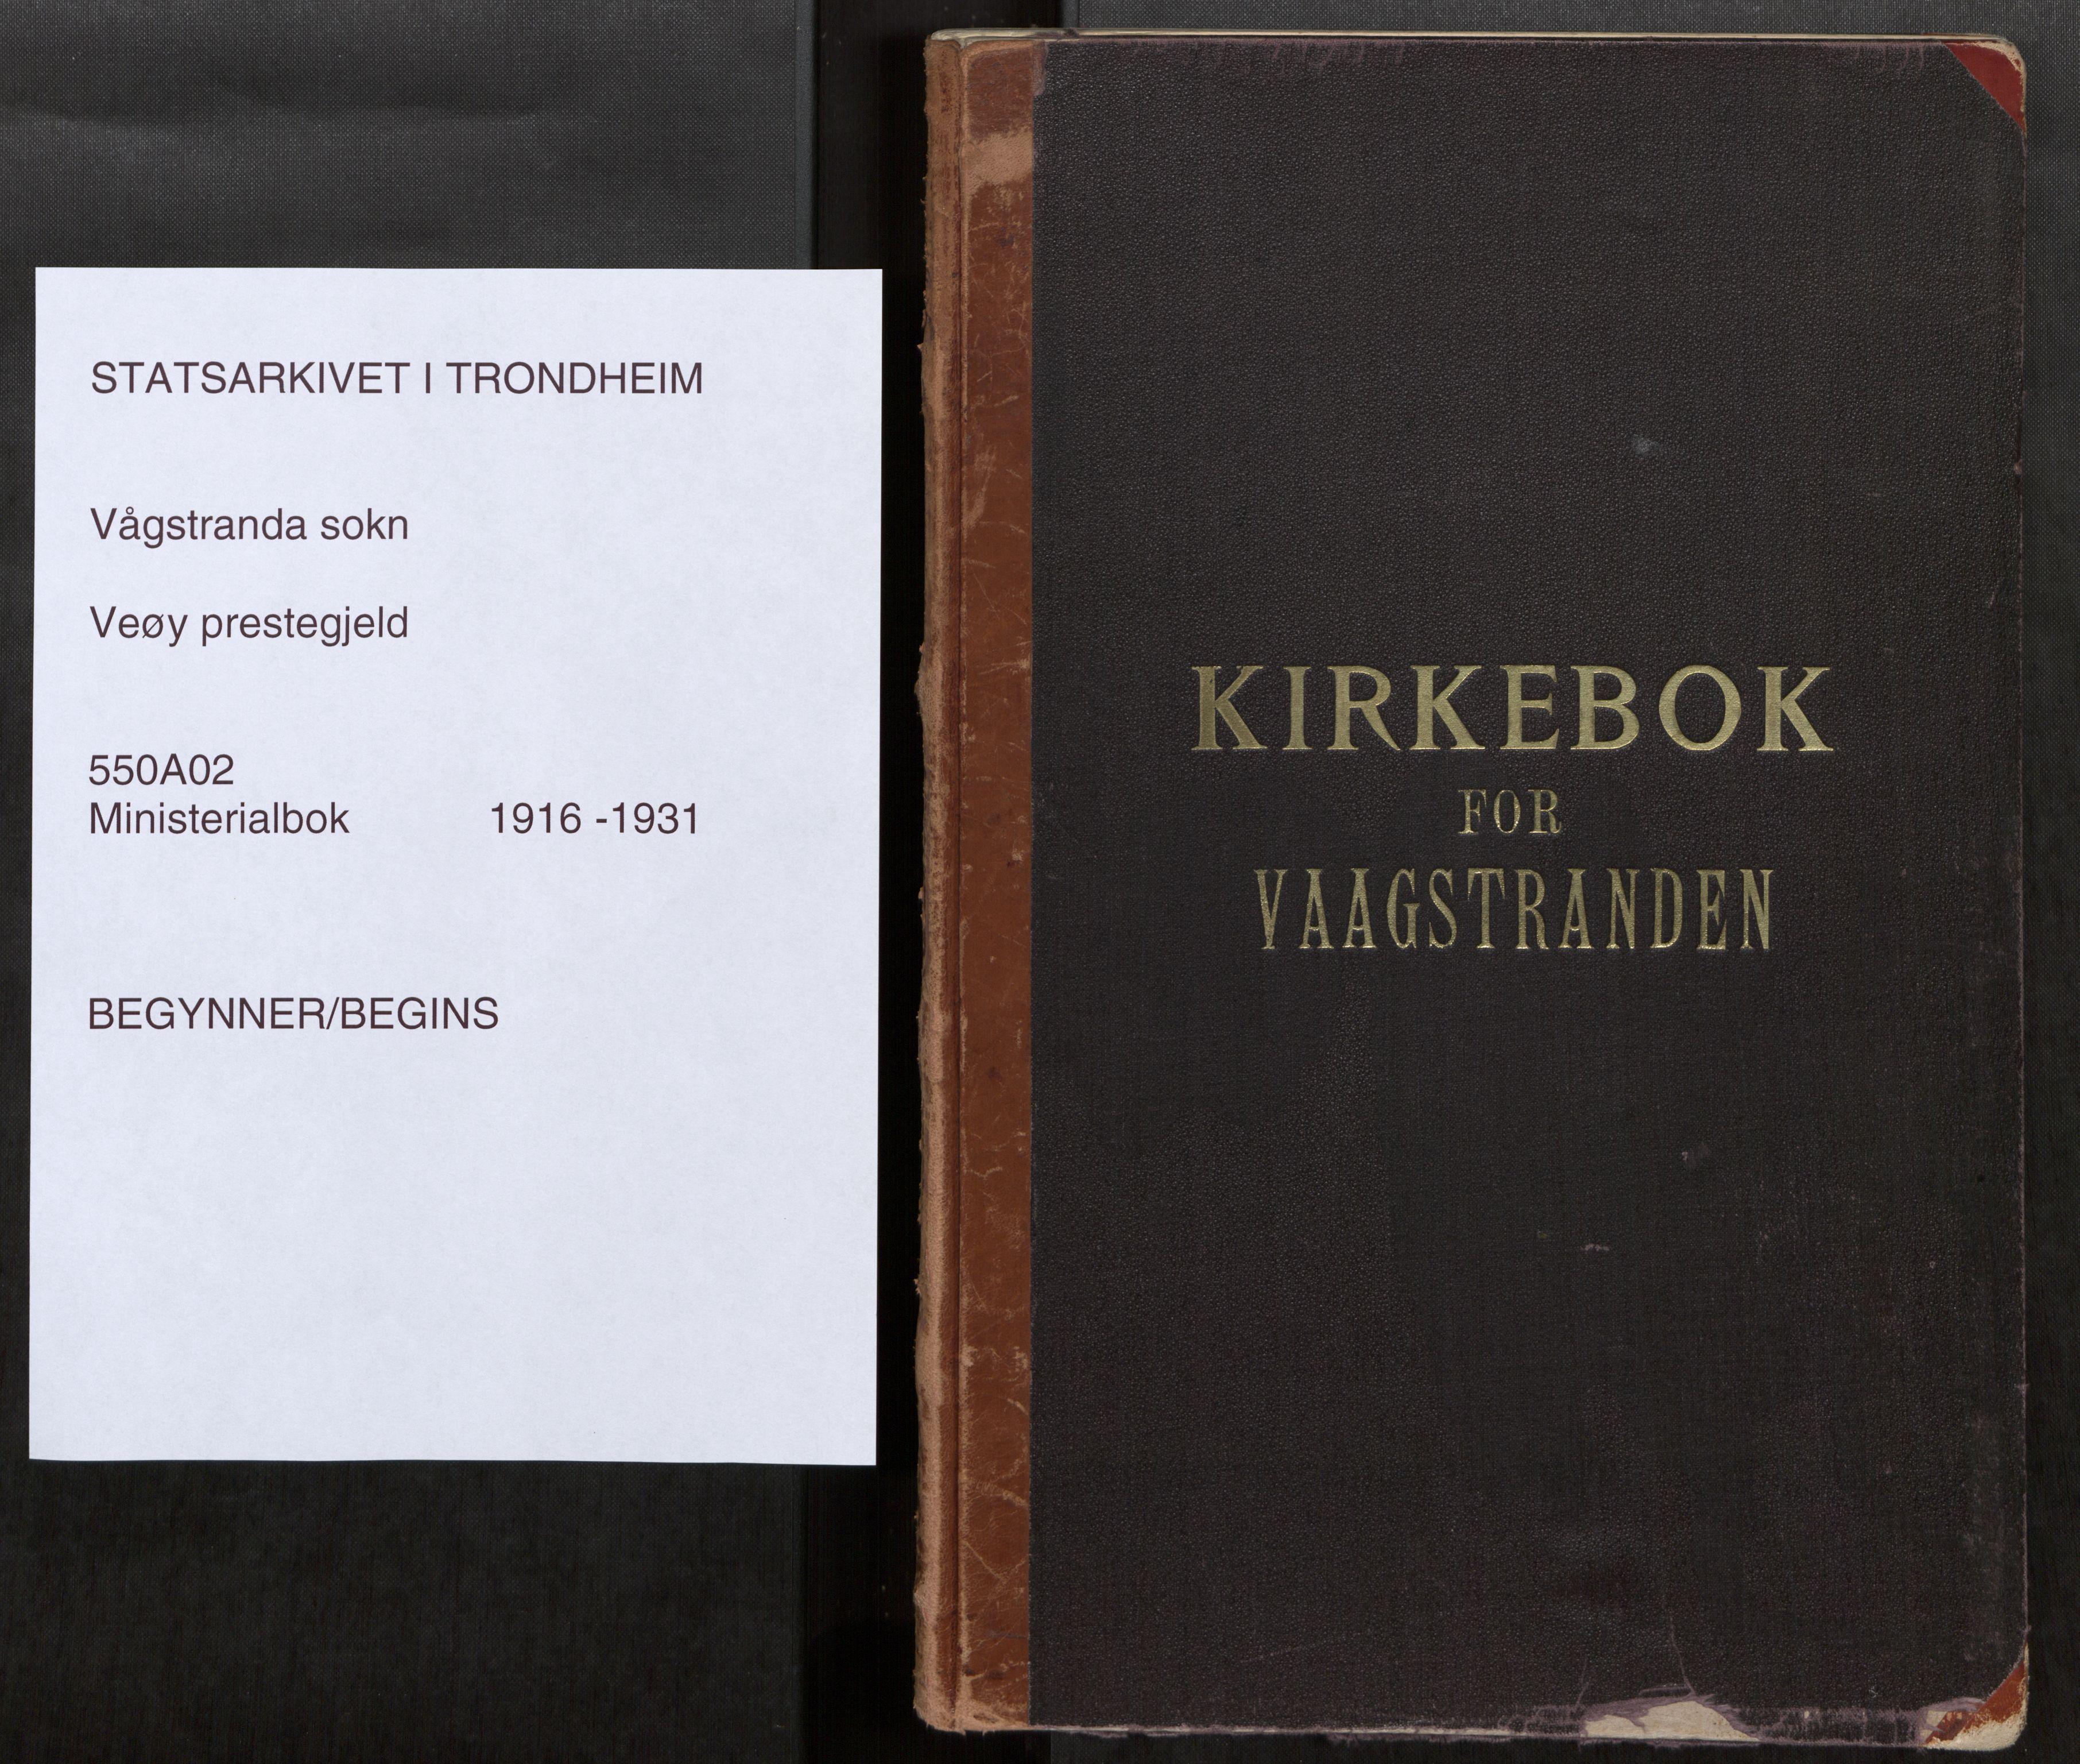 SAT, Grytten sokneprestkontor, Ministerialbok nr. 550A02, 1916-1931, s. upaginert